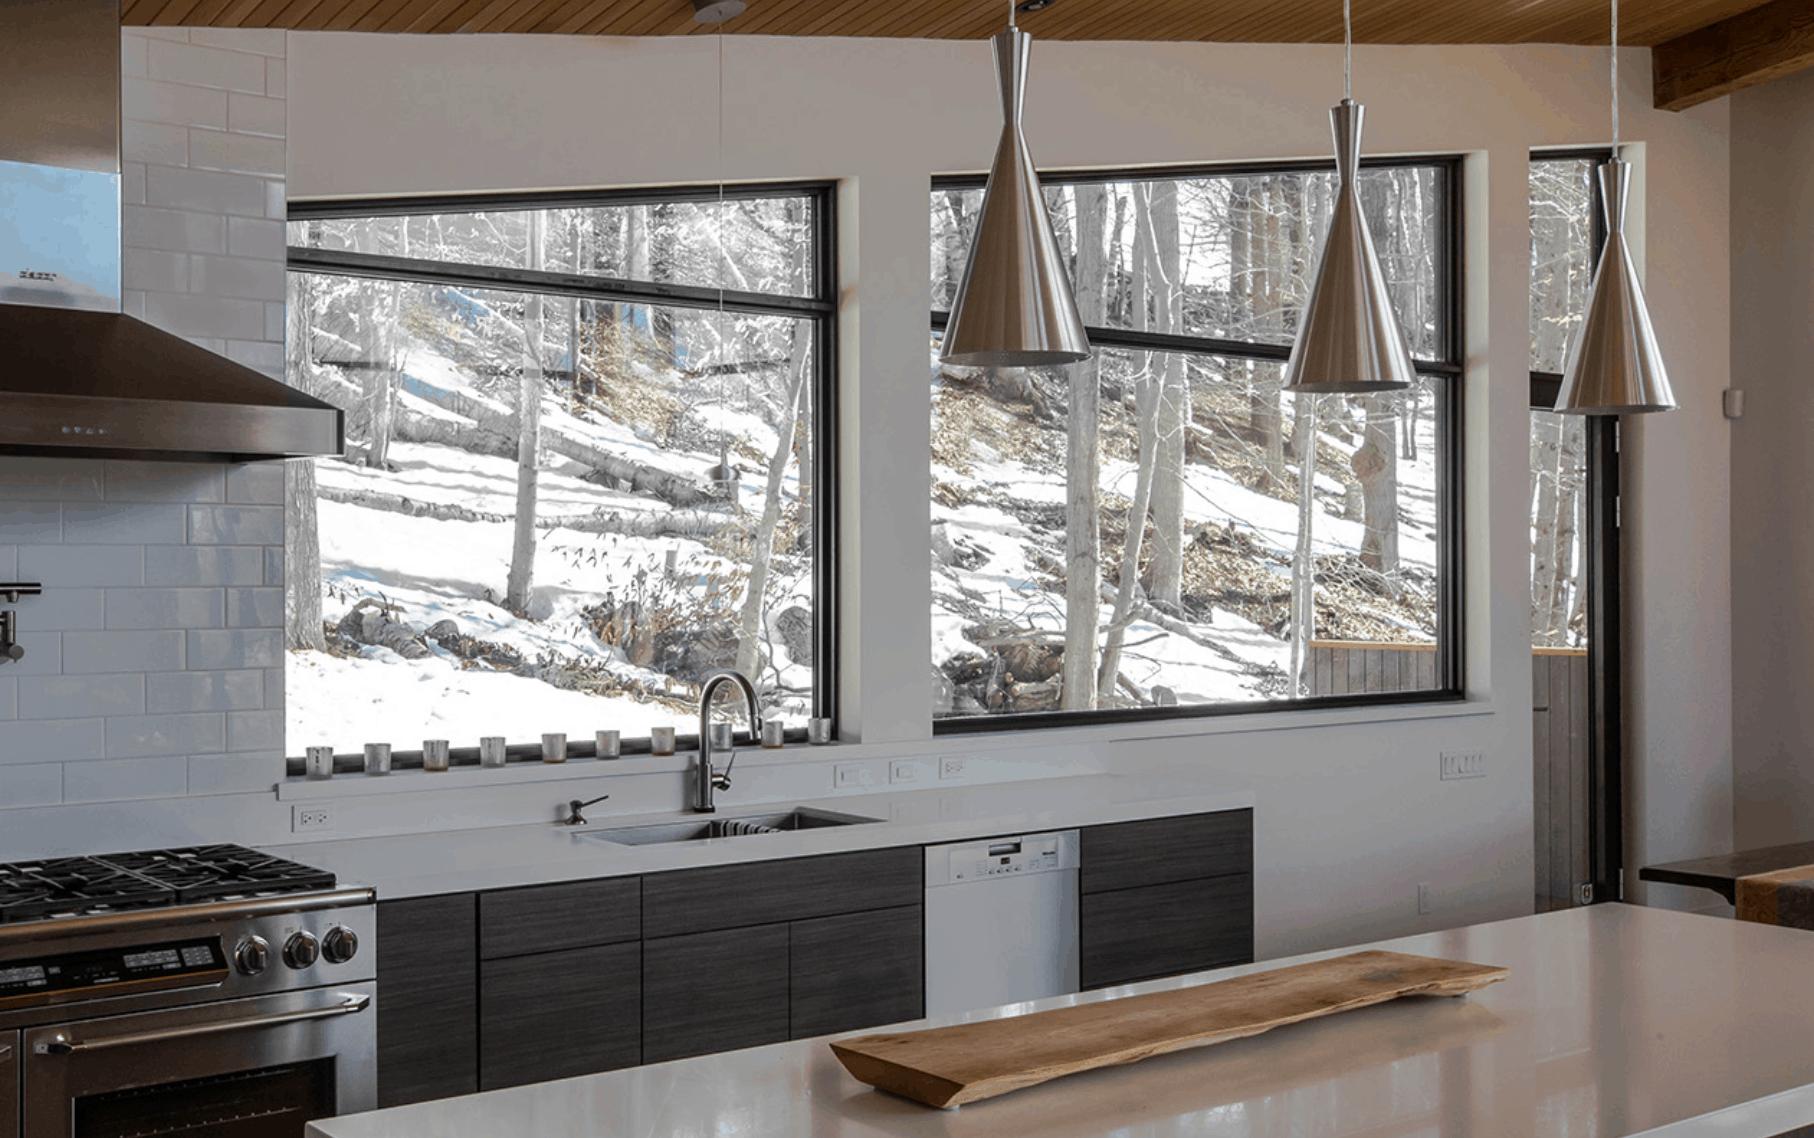 bigfoot windows kitchen